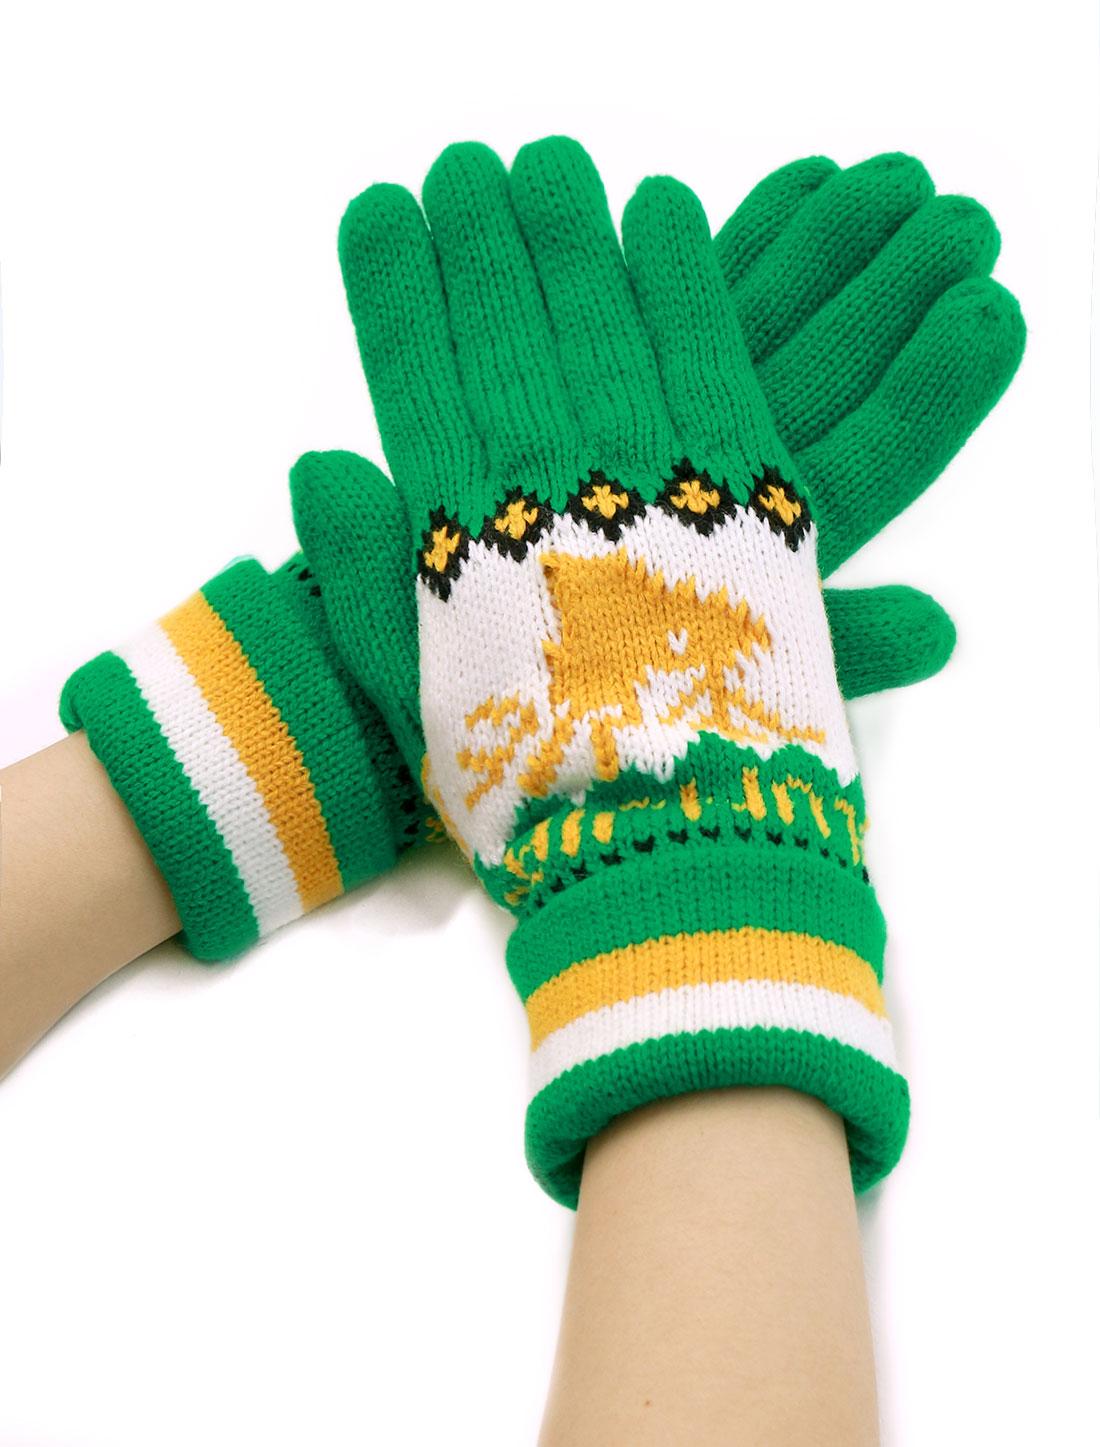 Unique Bargains Women's Wrist Length Deer Pattern Knit Roll Up Cuffed Gloves Pair Green